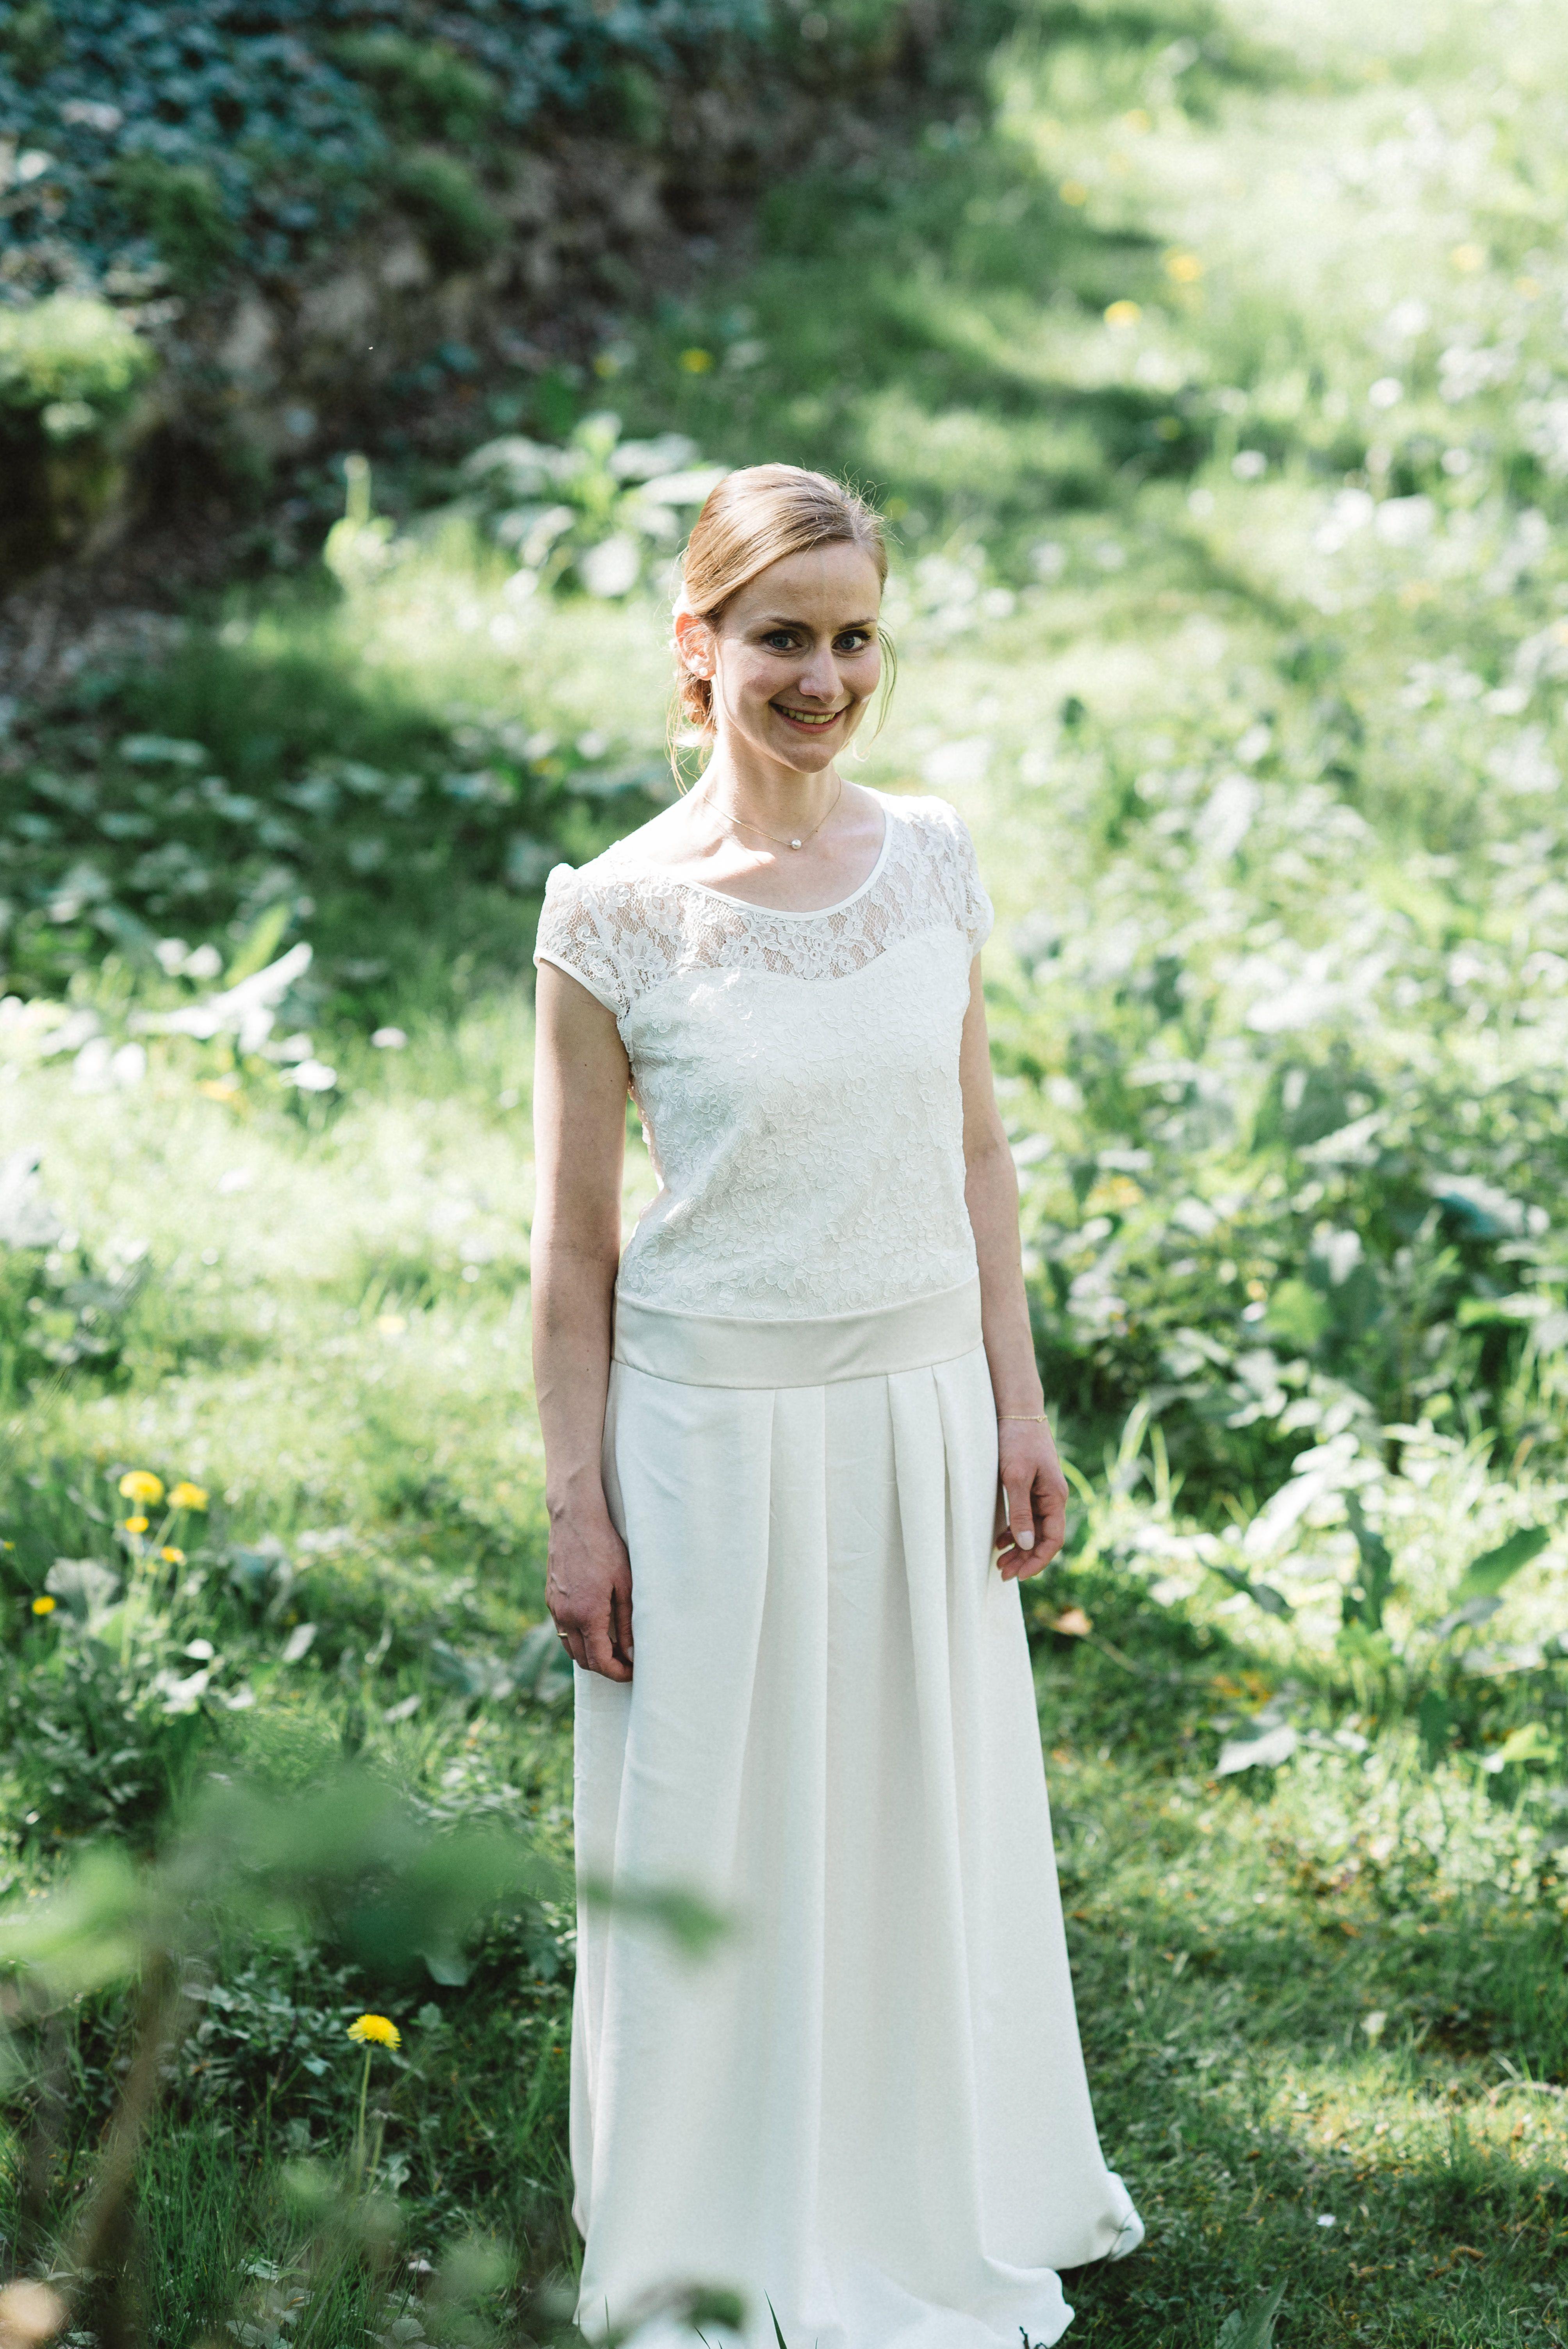 Labude Braut - Brautkleid Florentine Vintage Stil Boho Wedding dress ...